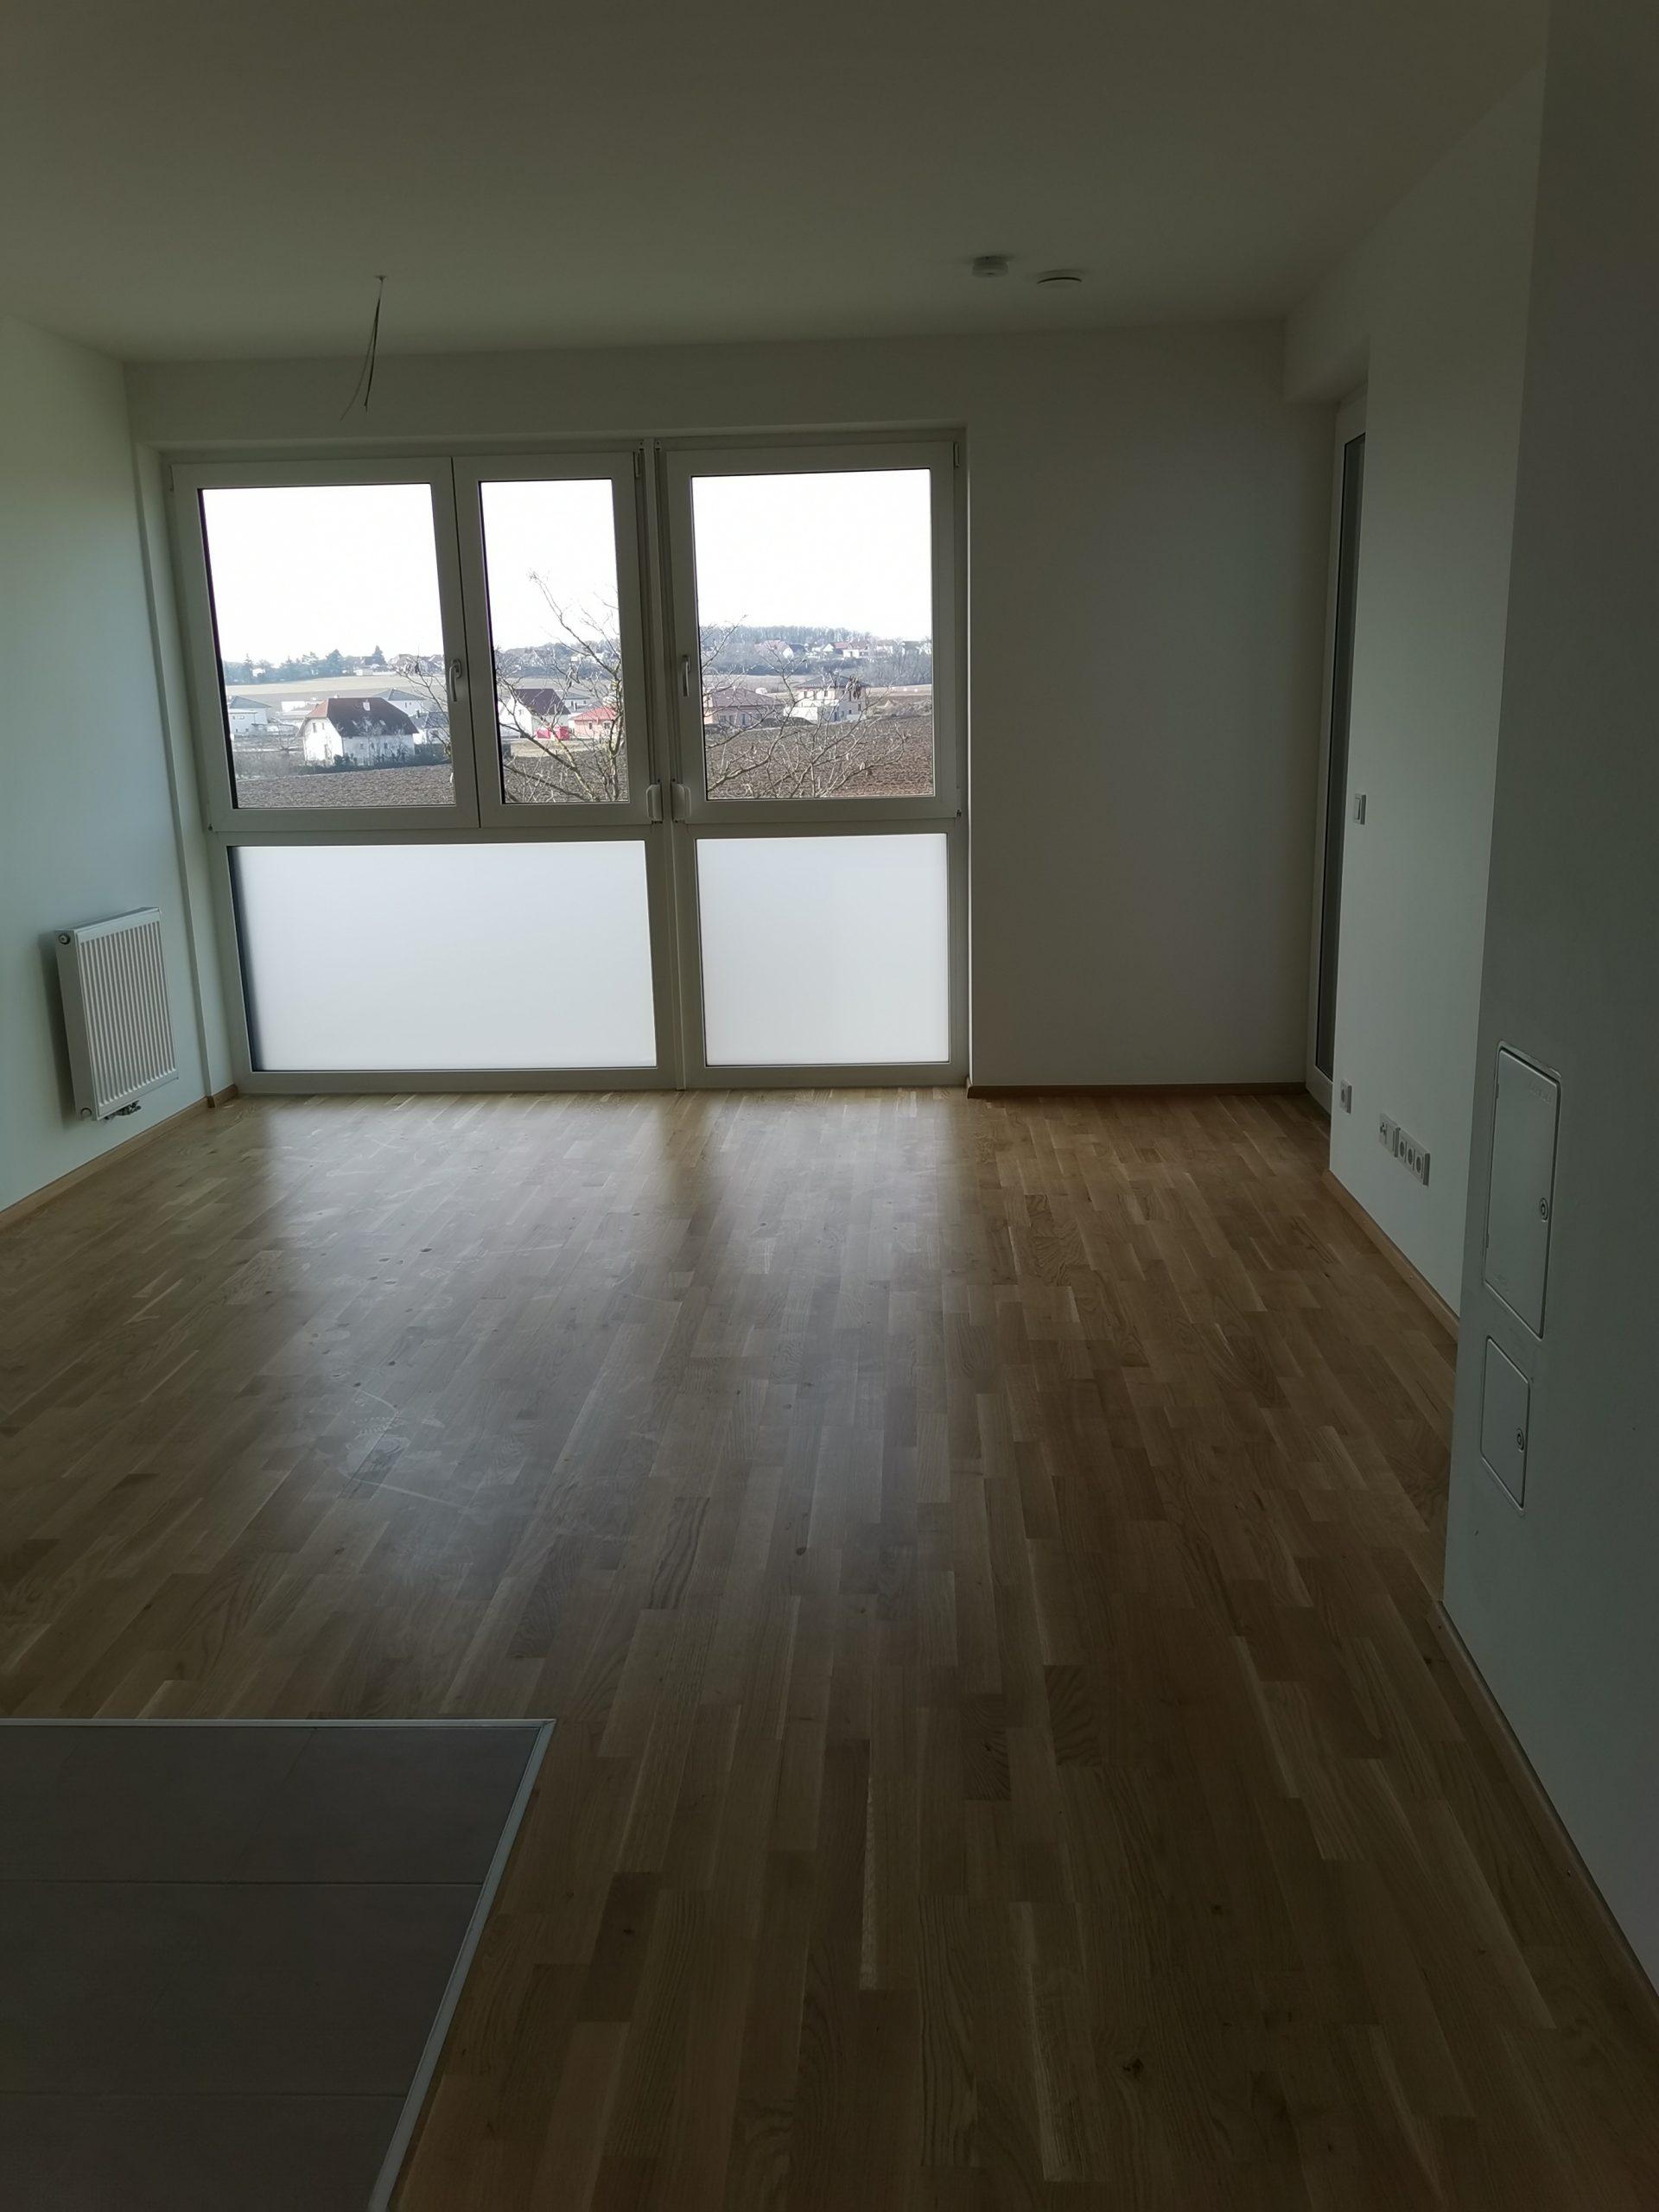 Immobilie von Kamptal in 3730 Eggenburg, Horn, Eggenburg VII - Top 211 #0